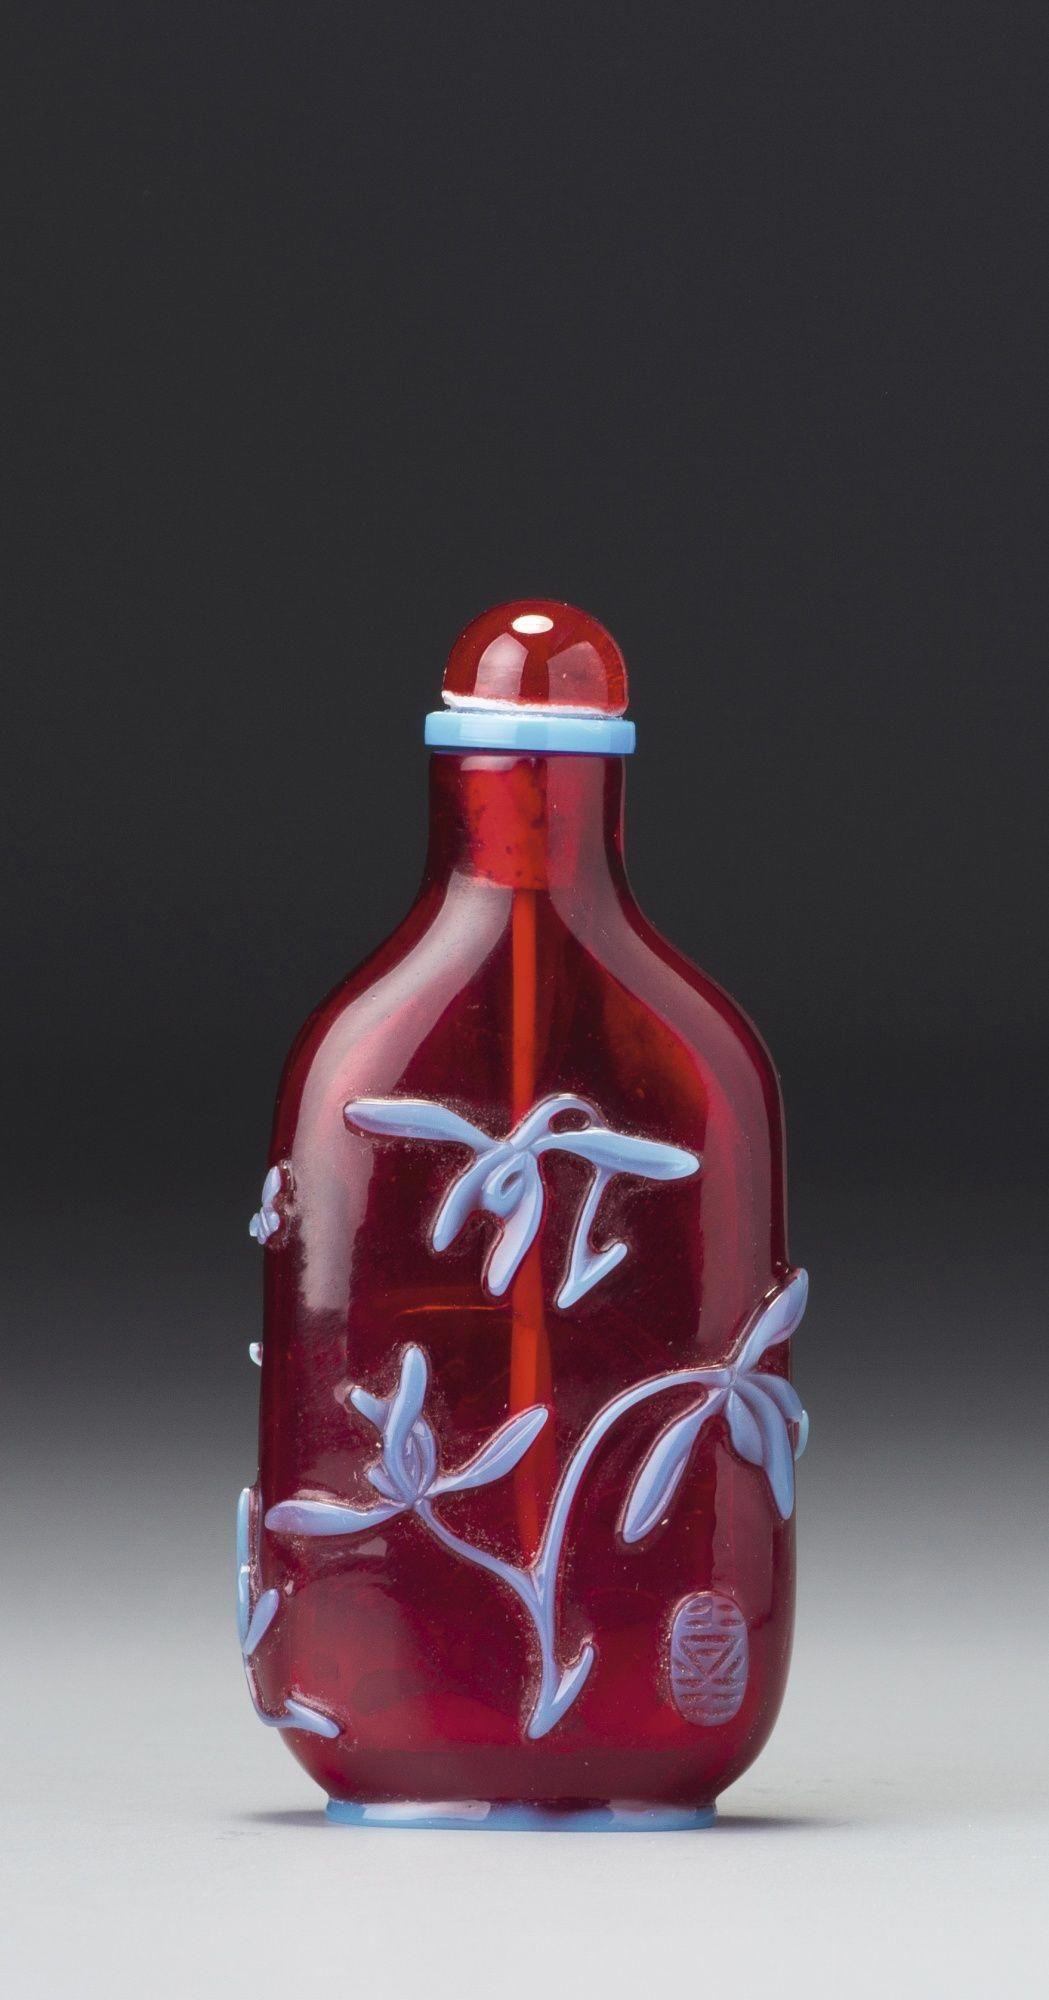 3d Printing Car Maserati 3dprintingringsilver With Images Snuff Bottle Antique Perfume Bottles Bottle